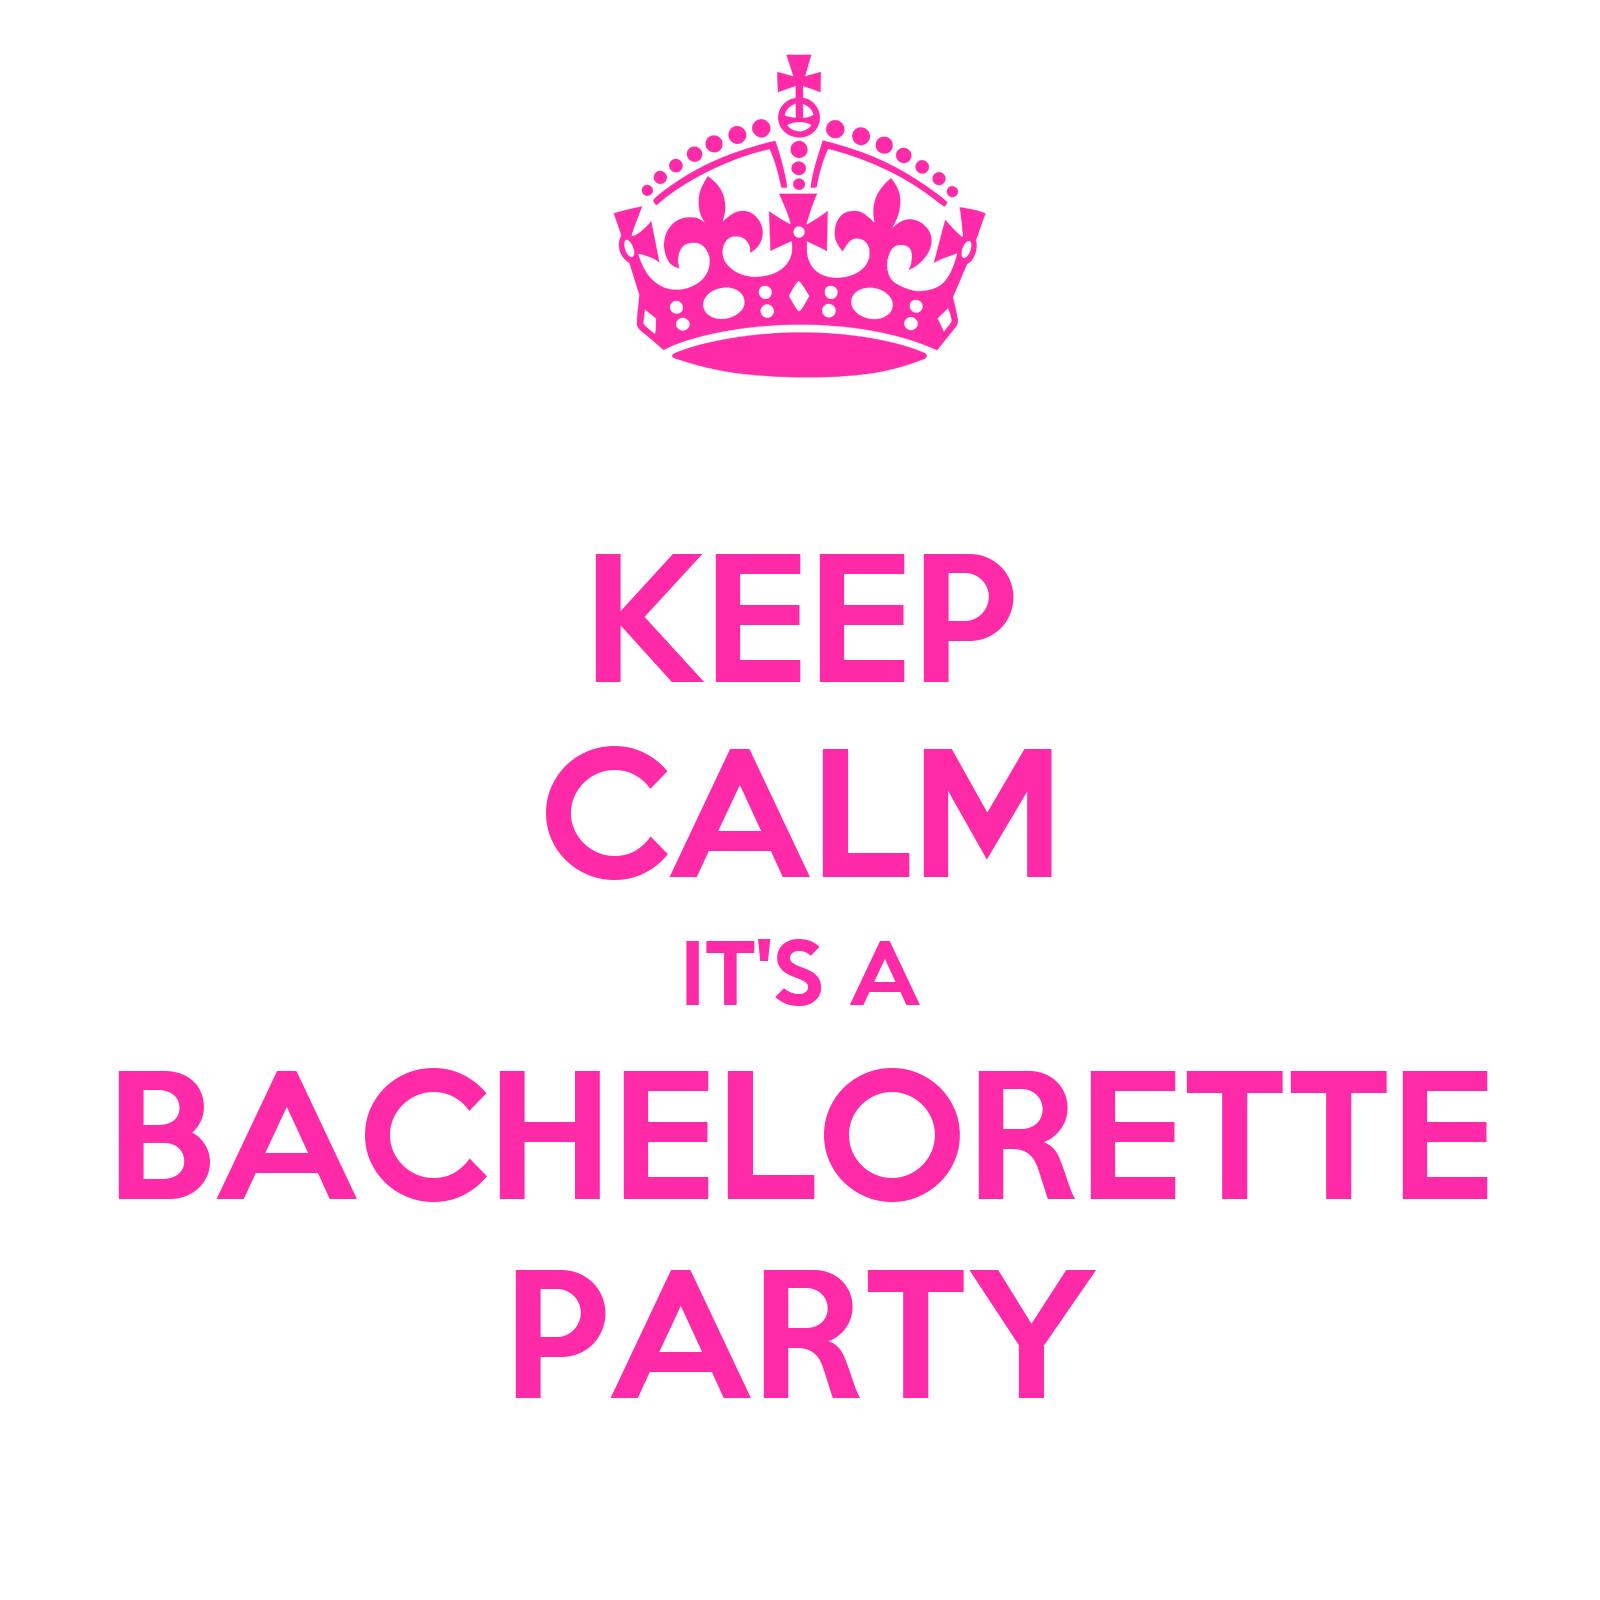 Source Sdkeepcalm O Maticcouk Report Bachelorette Party Logo